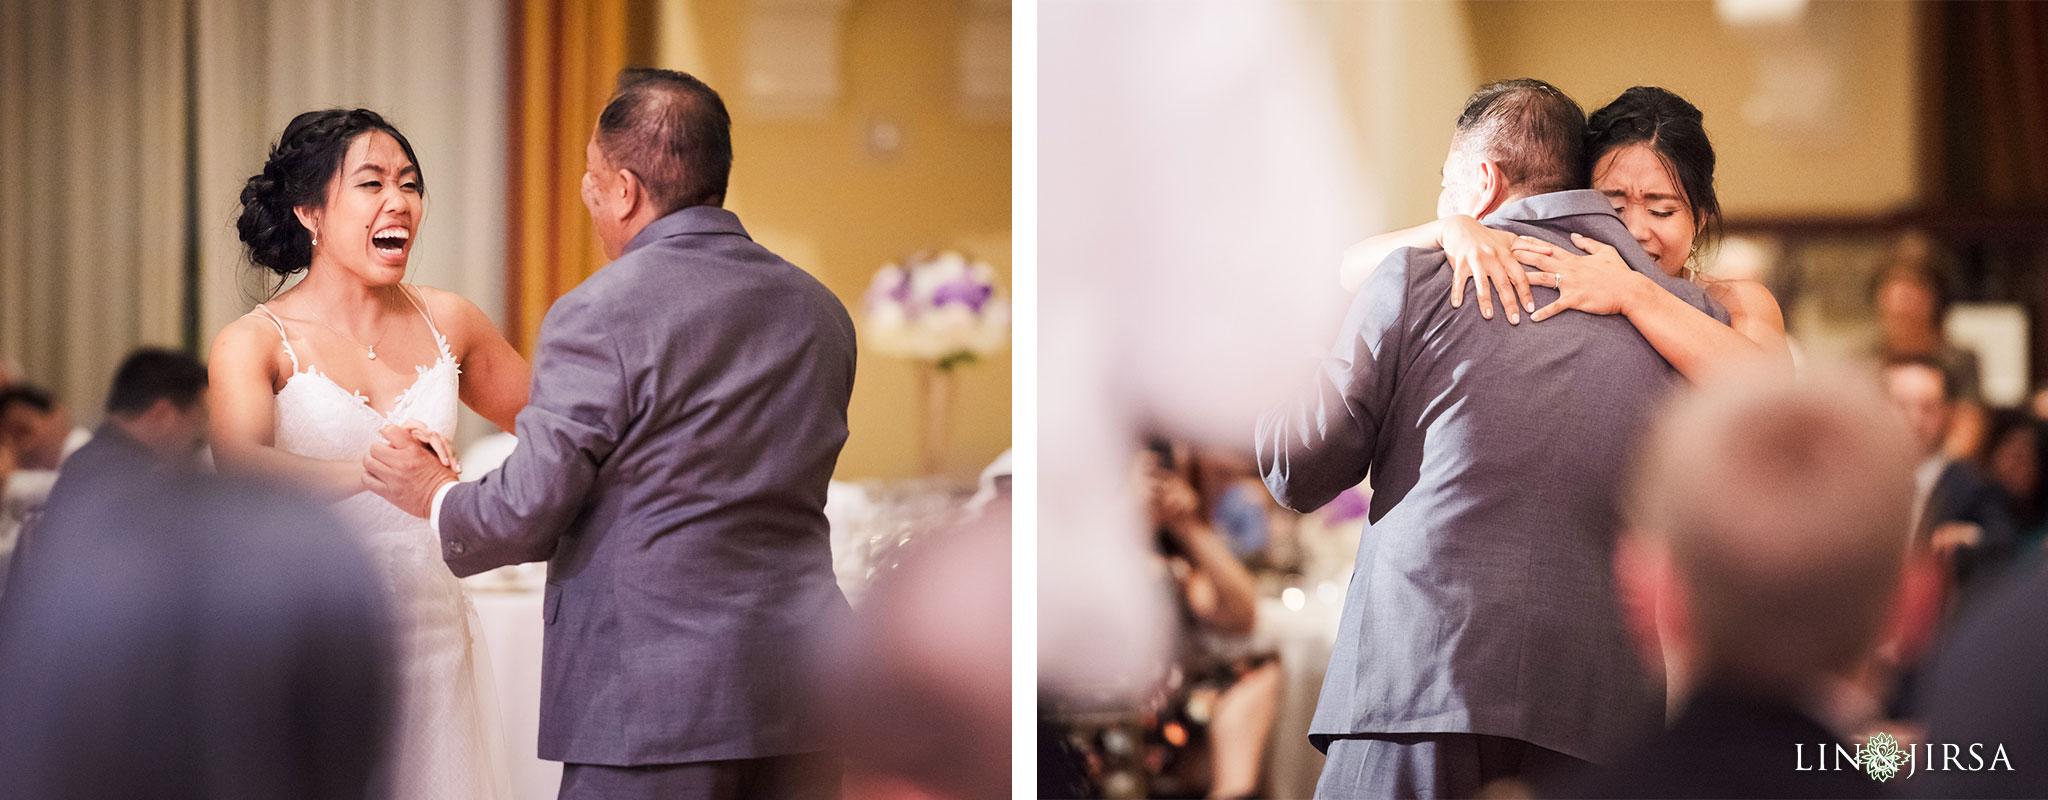 030 hyatt regency huntington beach wedding reception photography